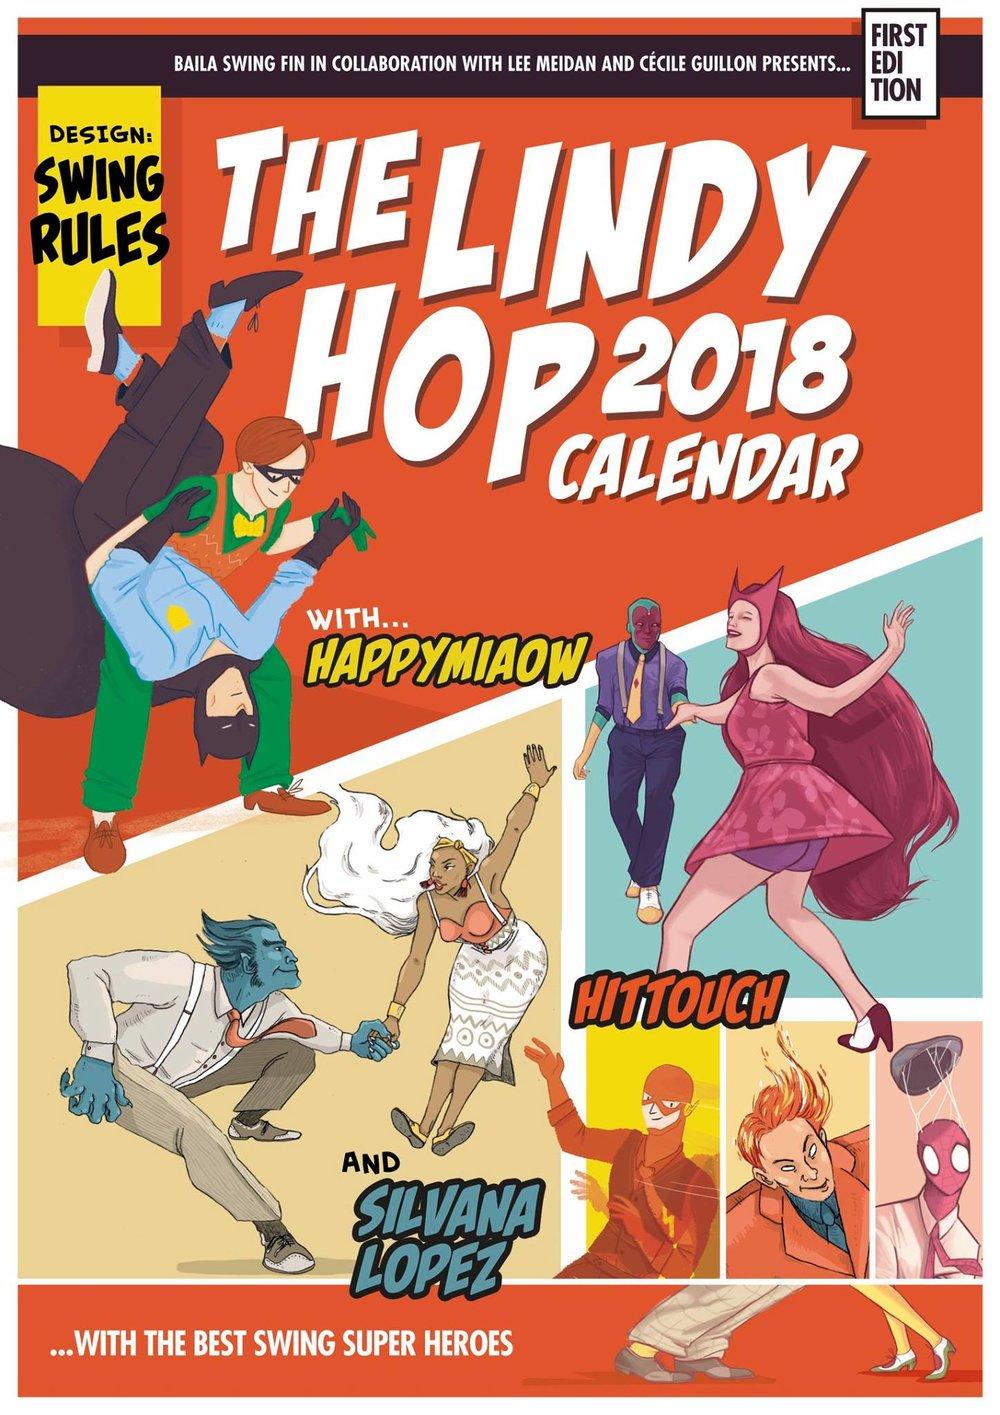 lindy hop calendar.jpg